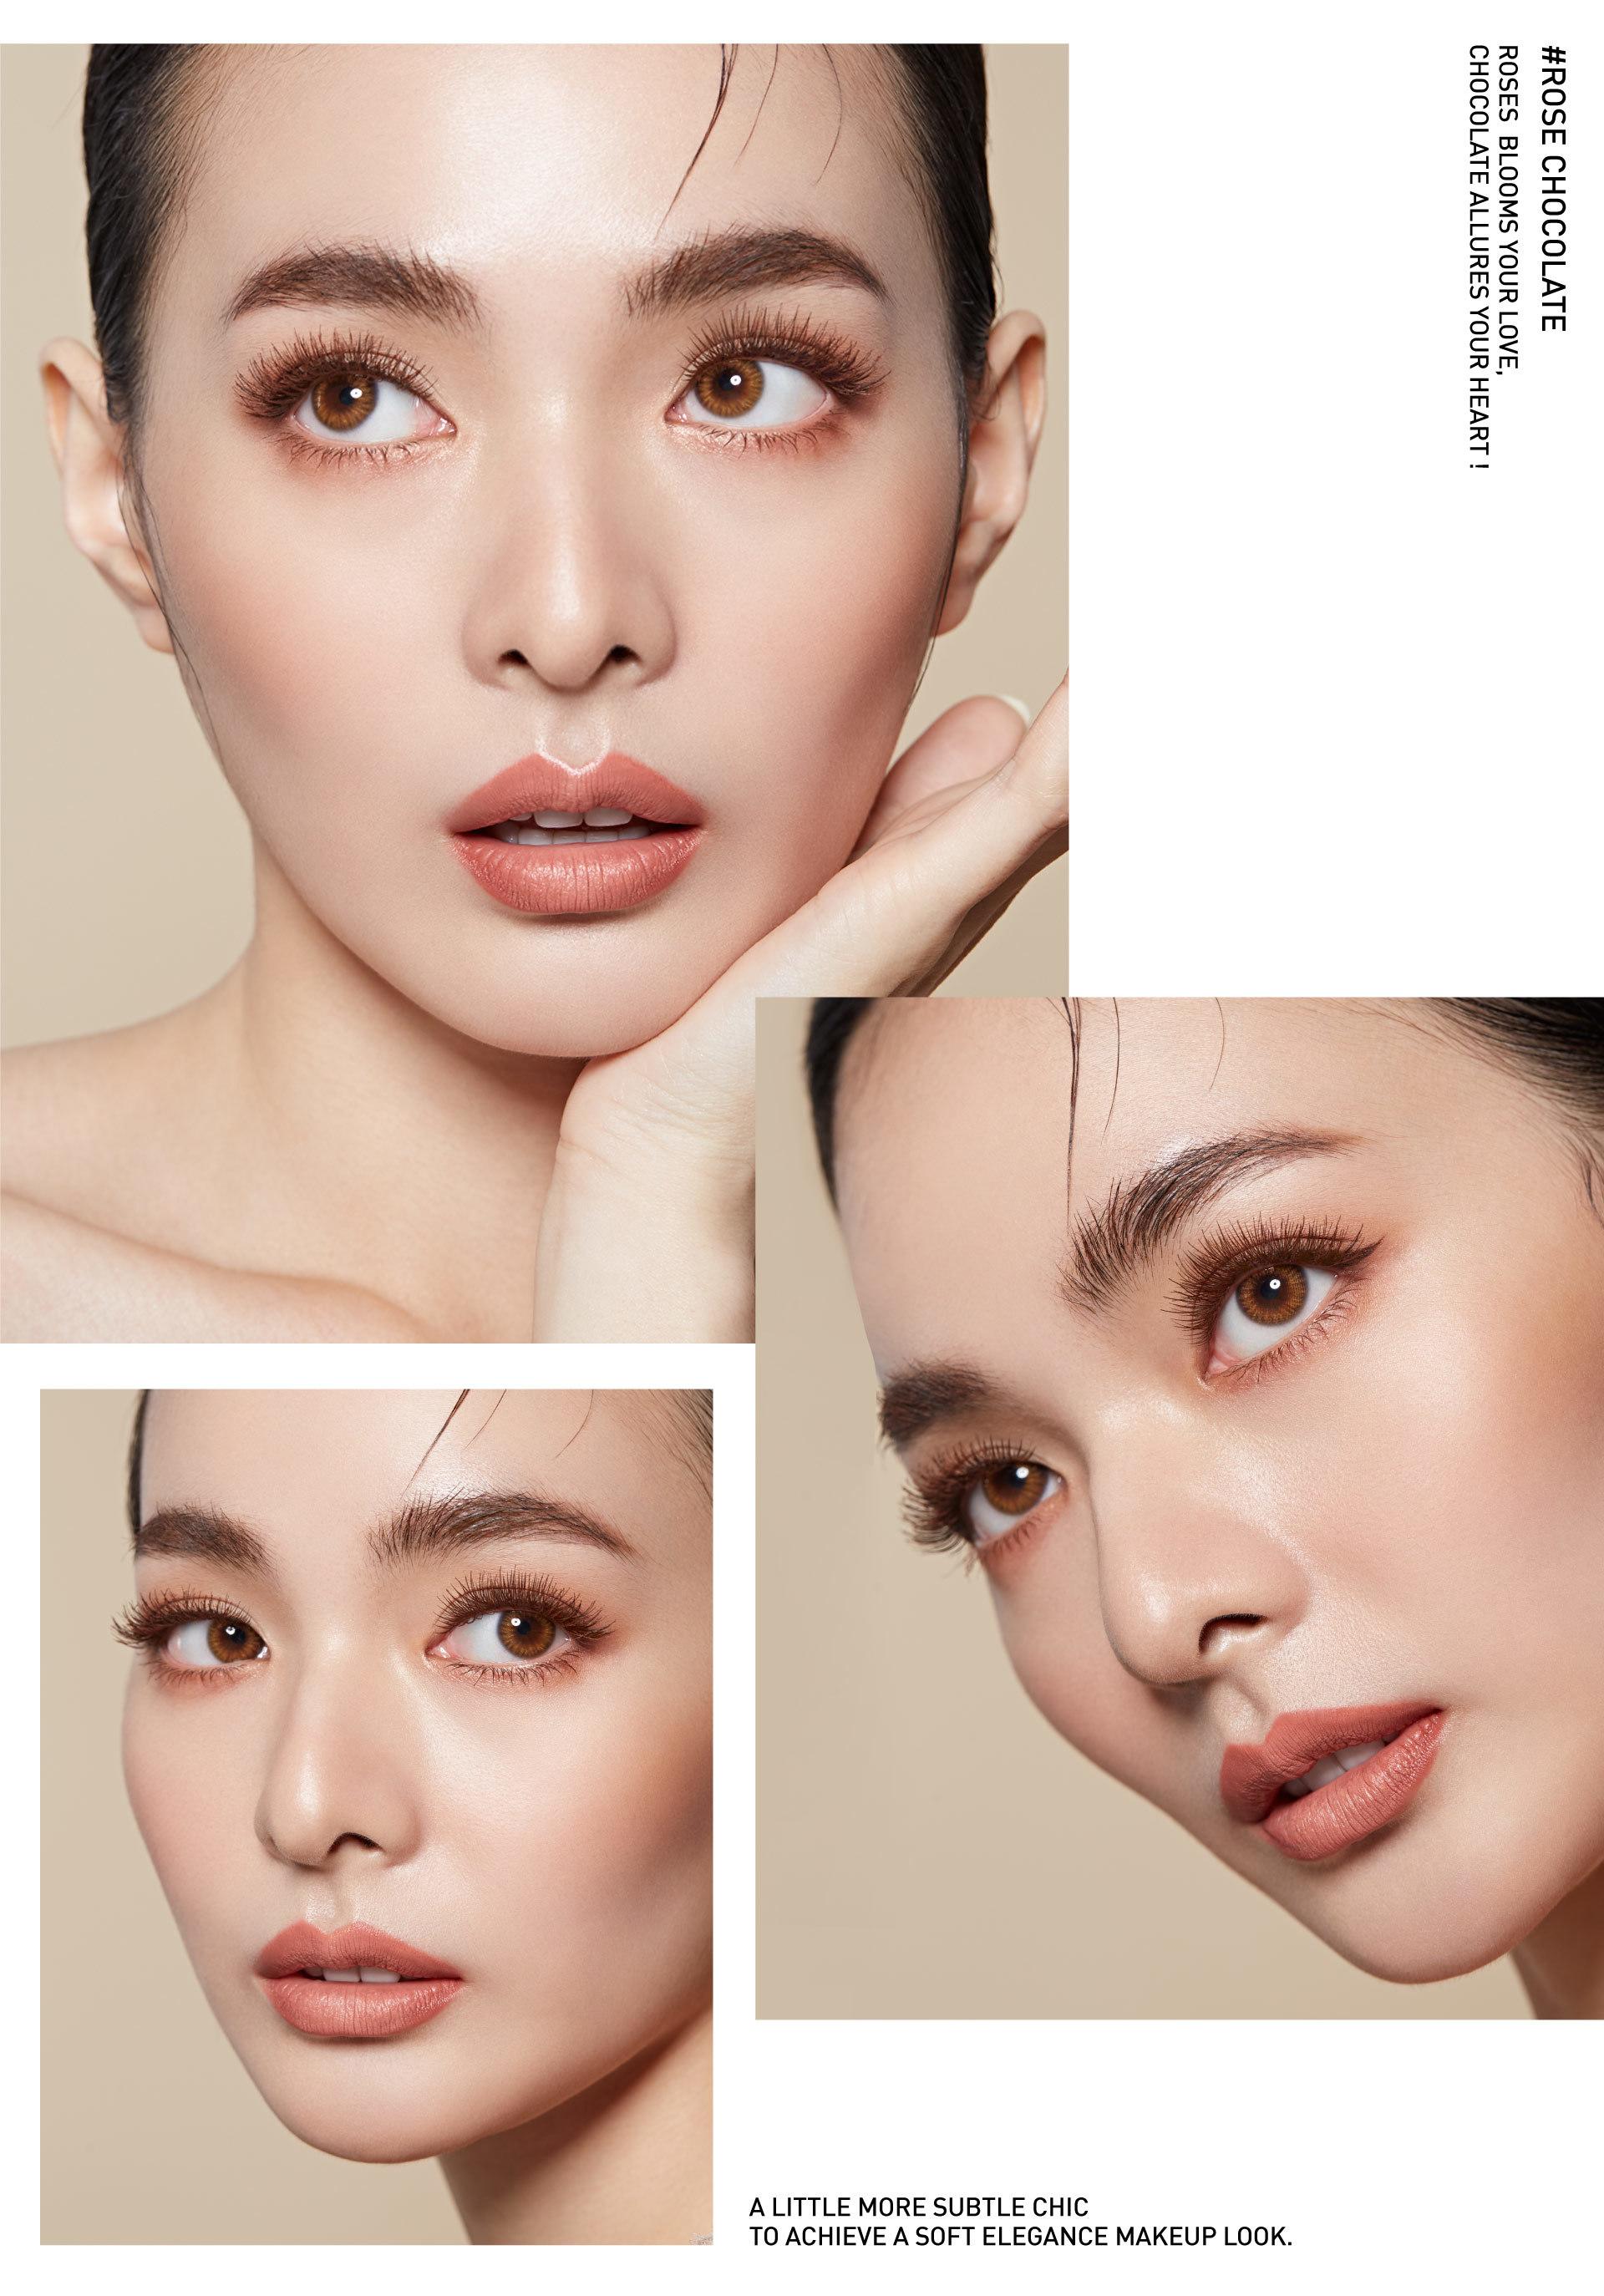 kaibeauty, mascara, rose chocolate, eyelash, eye, shipping, makeup, 小凱